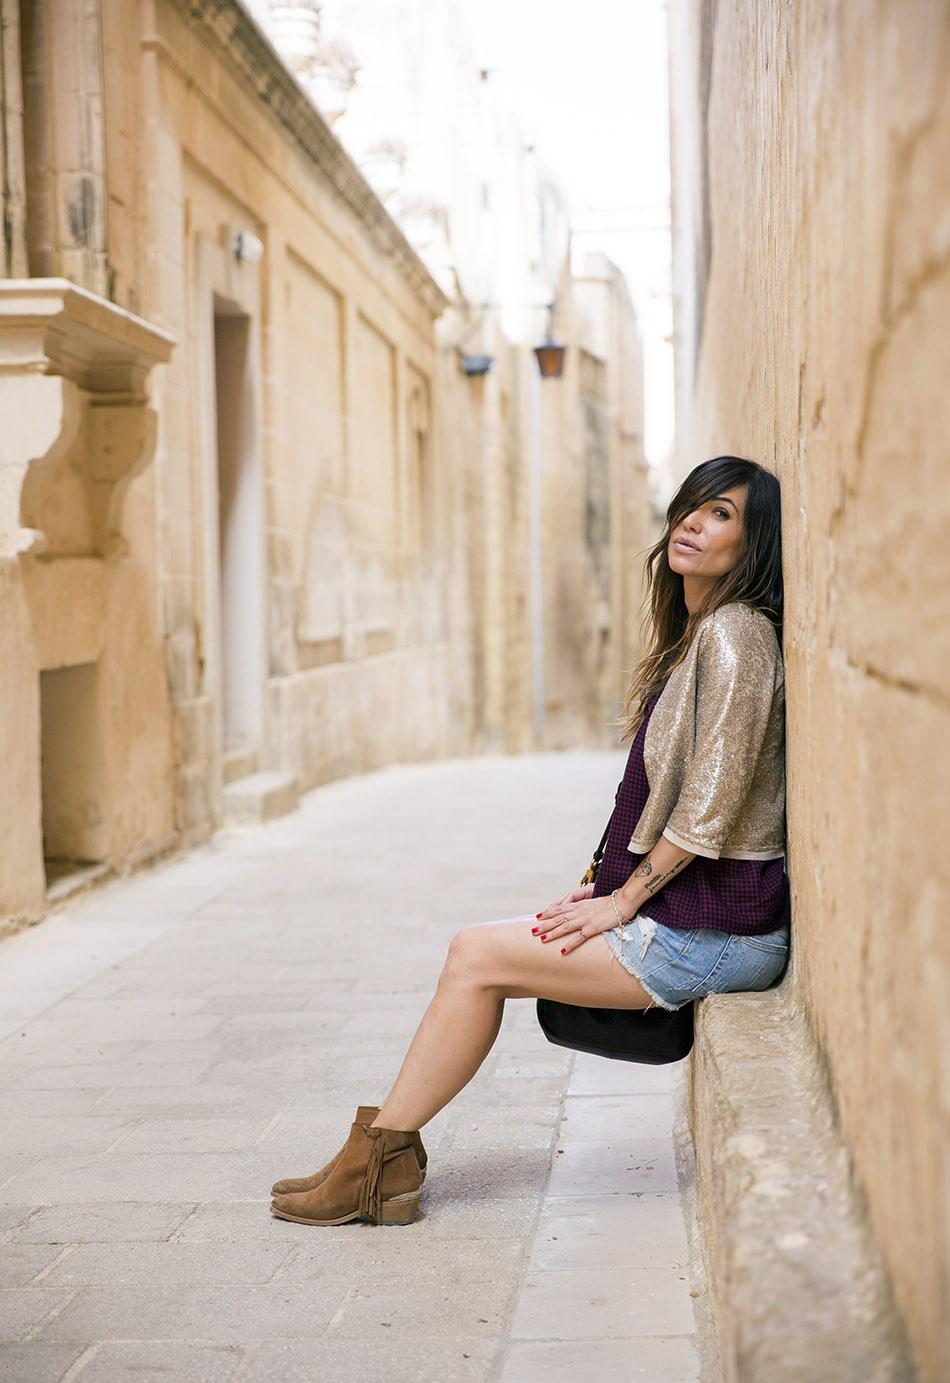 street style june 2016 outfits review bárbara crespo 05